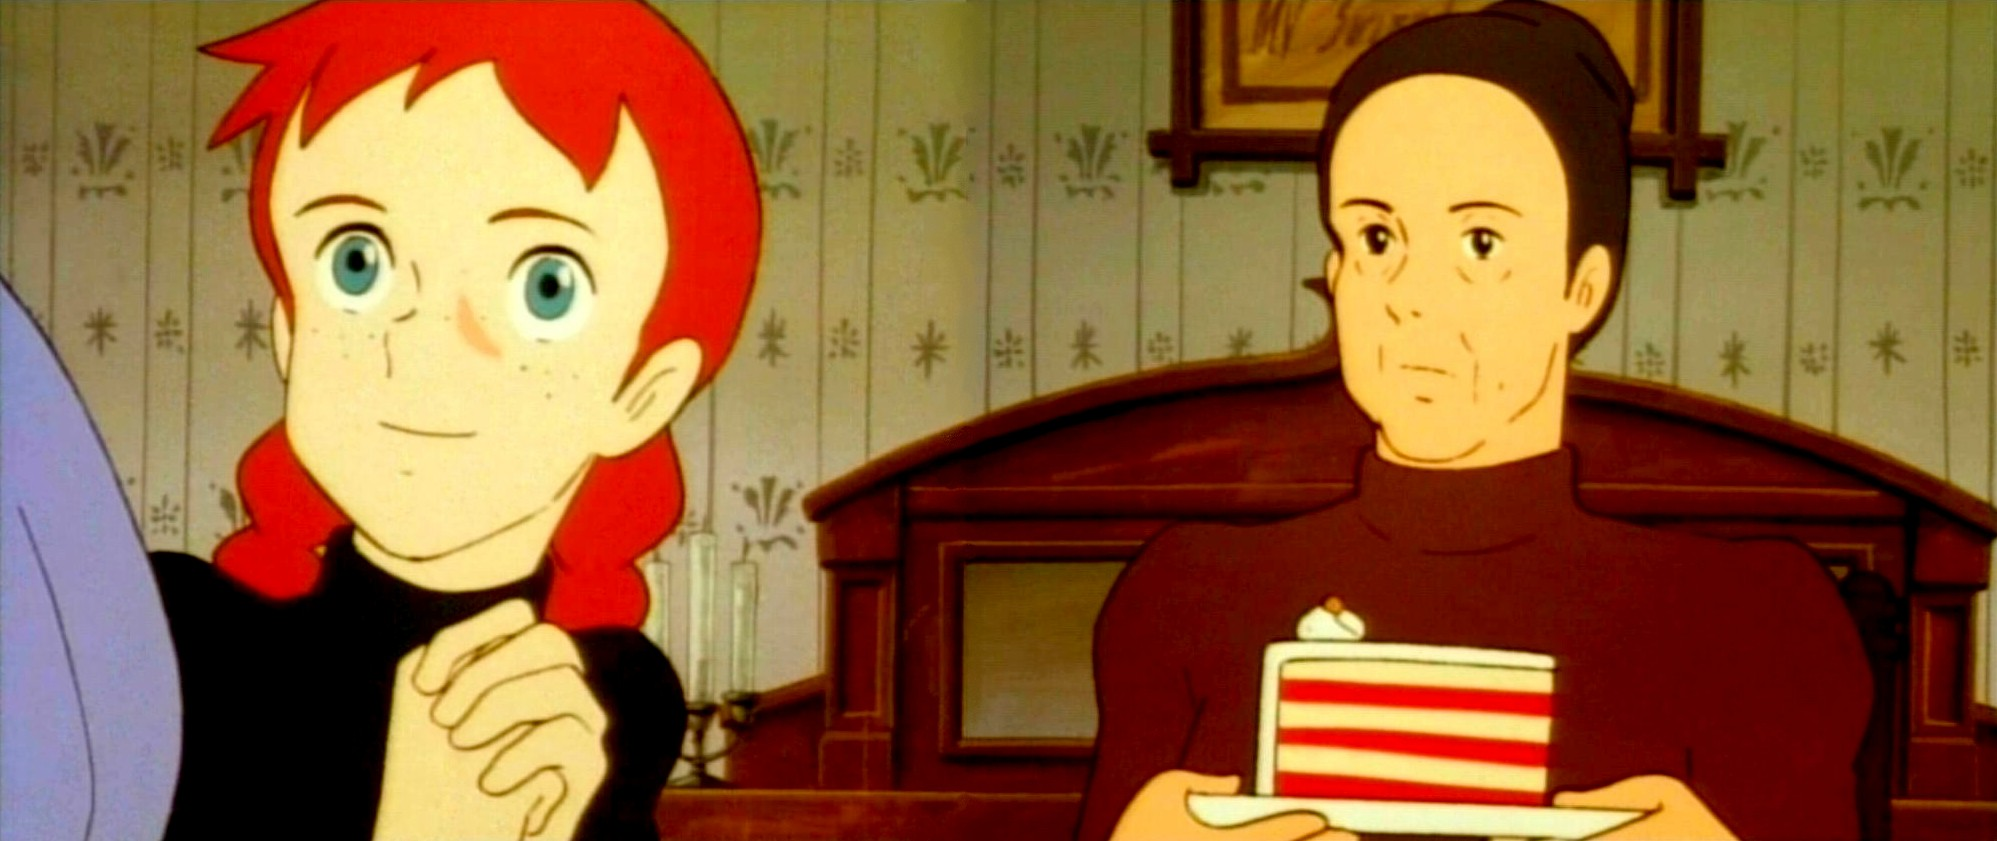 Anna d pelli rossi new edt amazon cartoni animati film